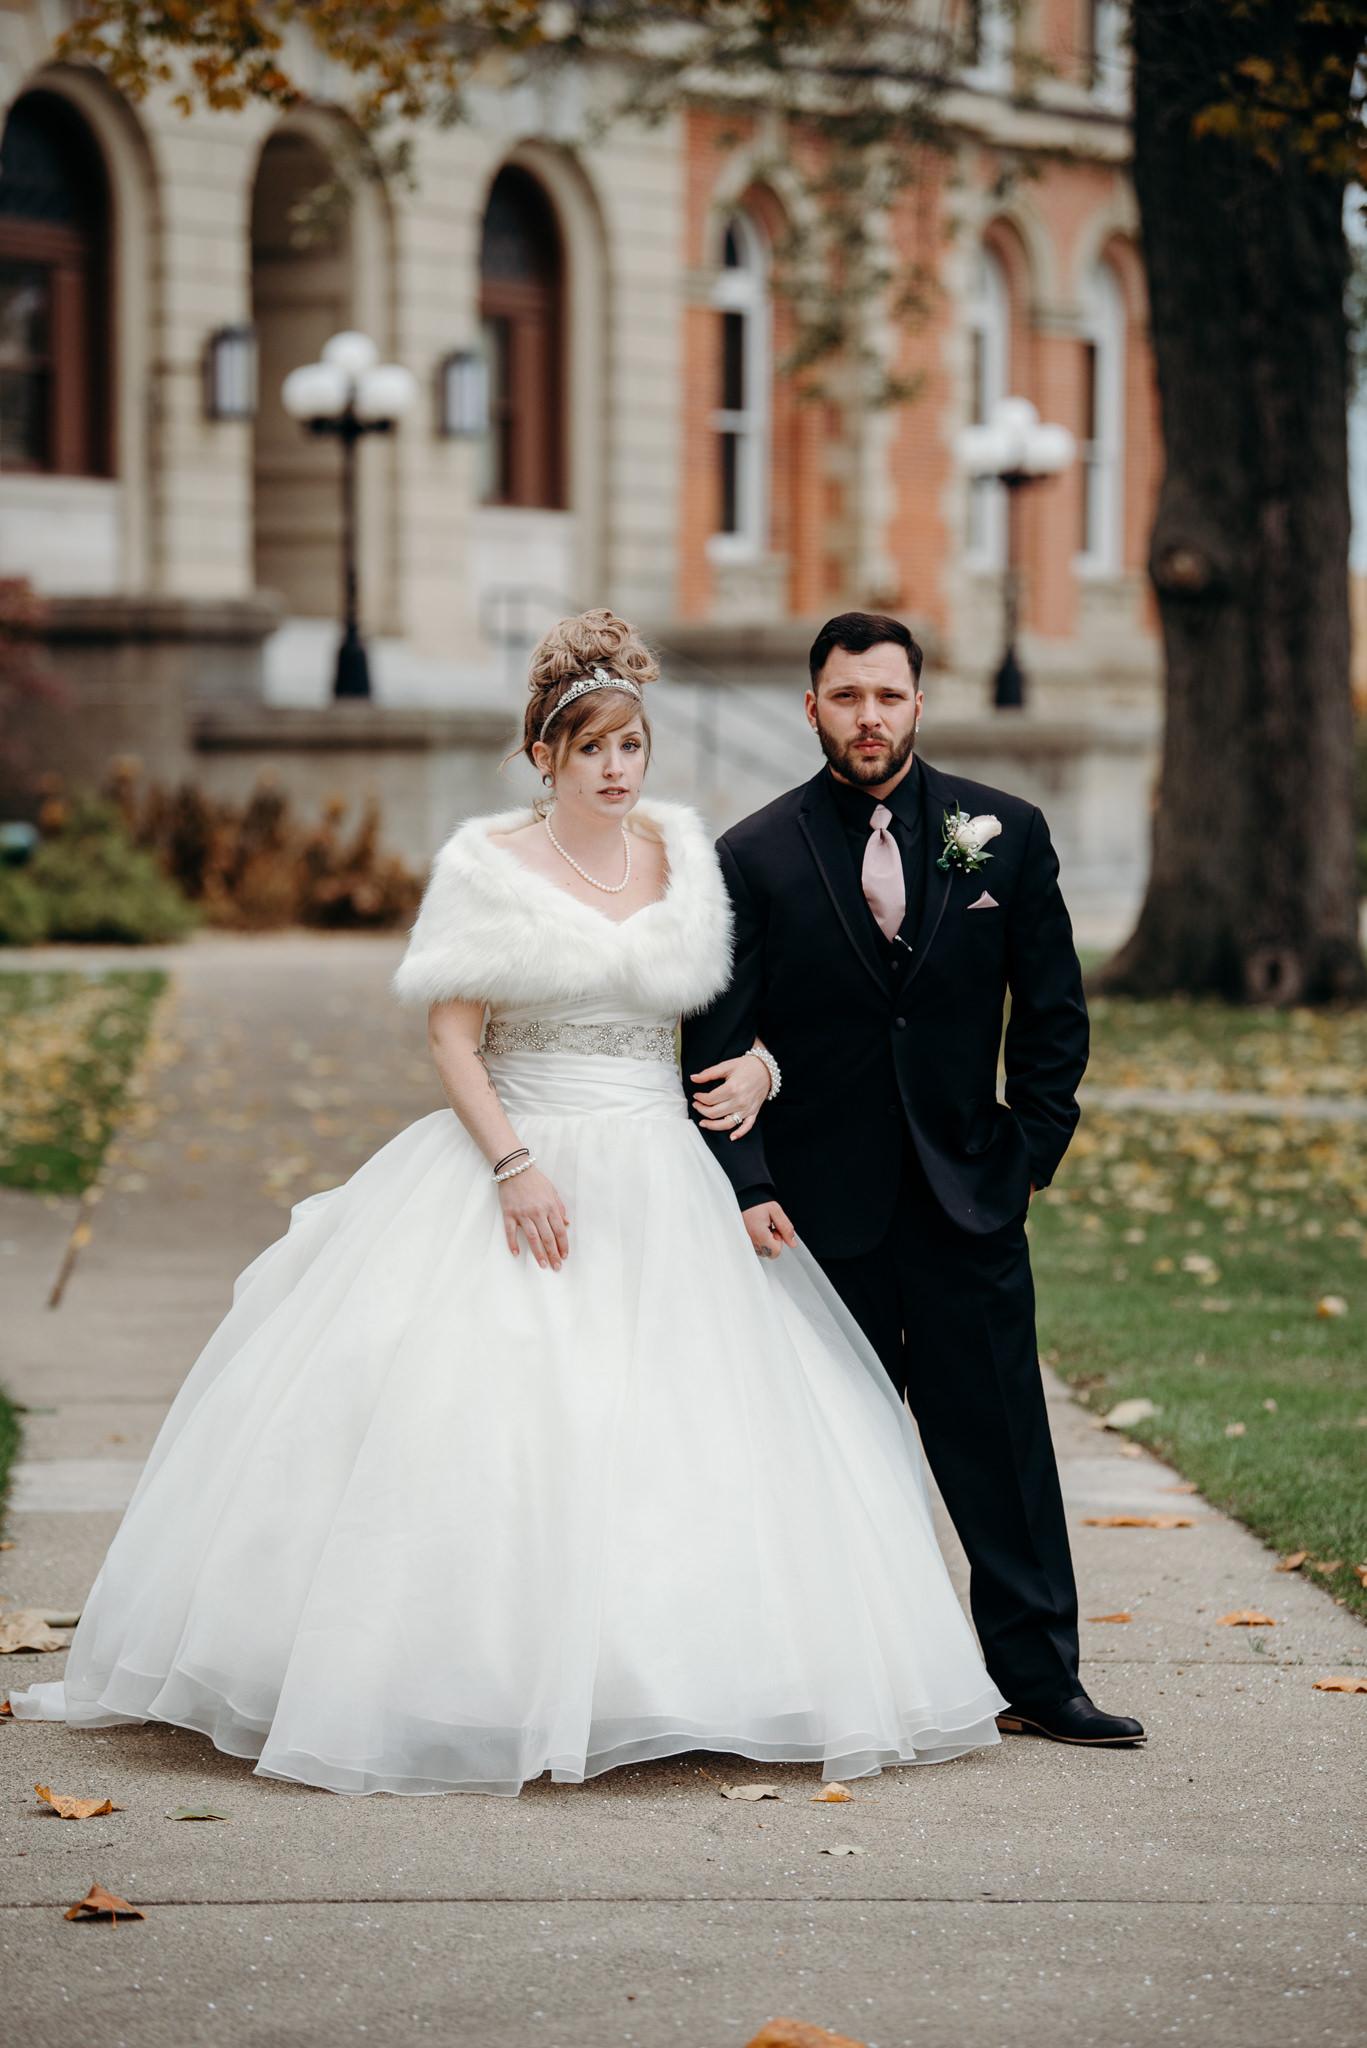 Grant Beachy Photo portrait wedding goshen elkhart south bend chicago-033.jpg